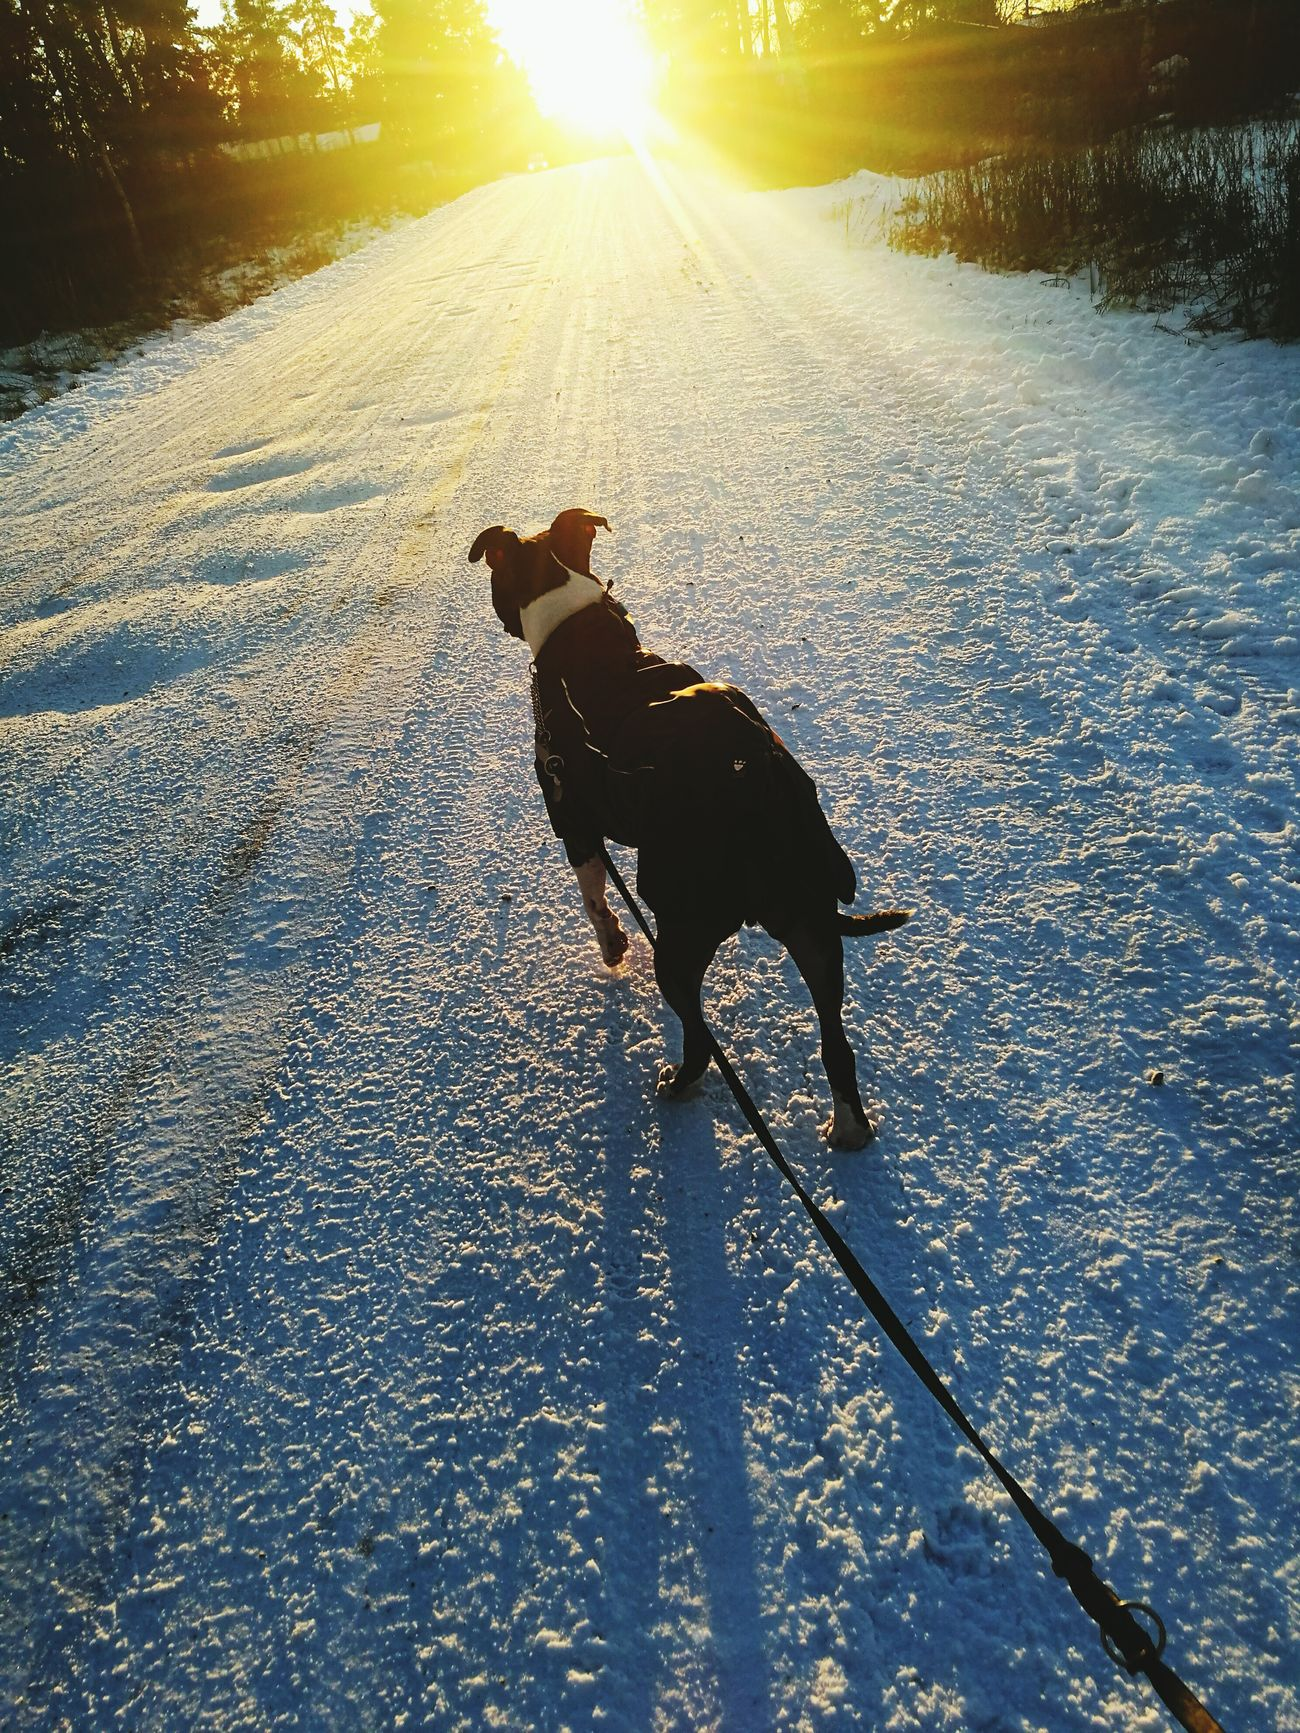 Amstafflove Dog❤ Amstaff Winter Love ♥ ❄ Finland Enjoying Life Doglife